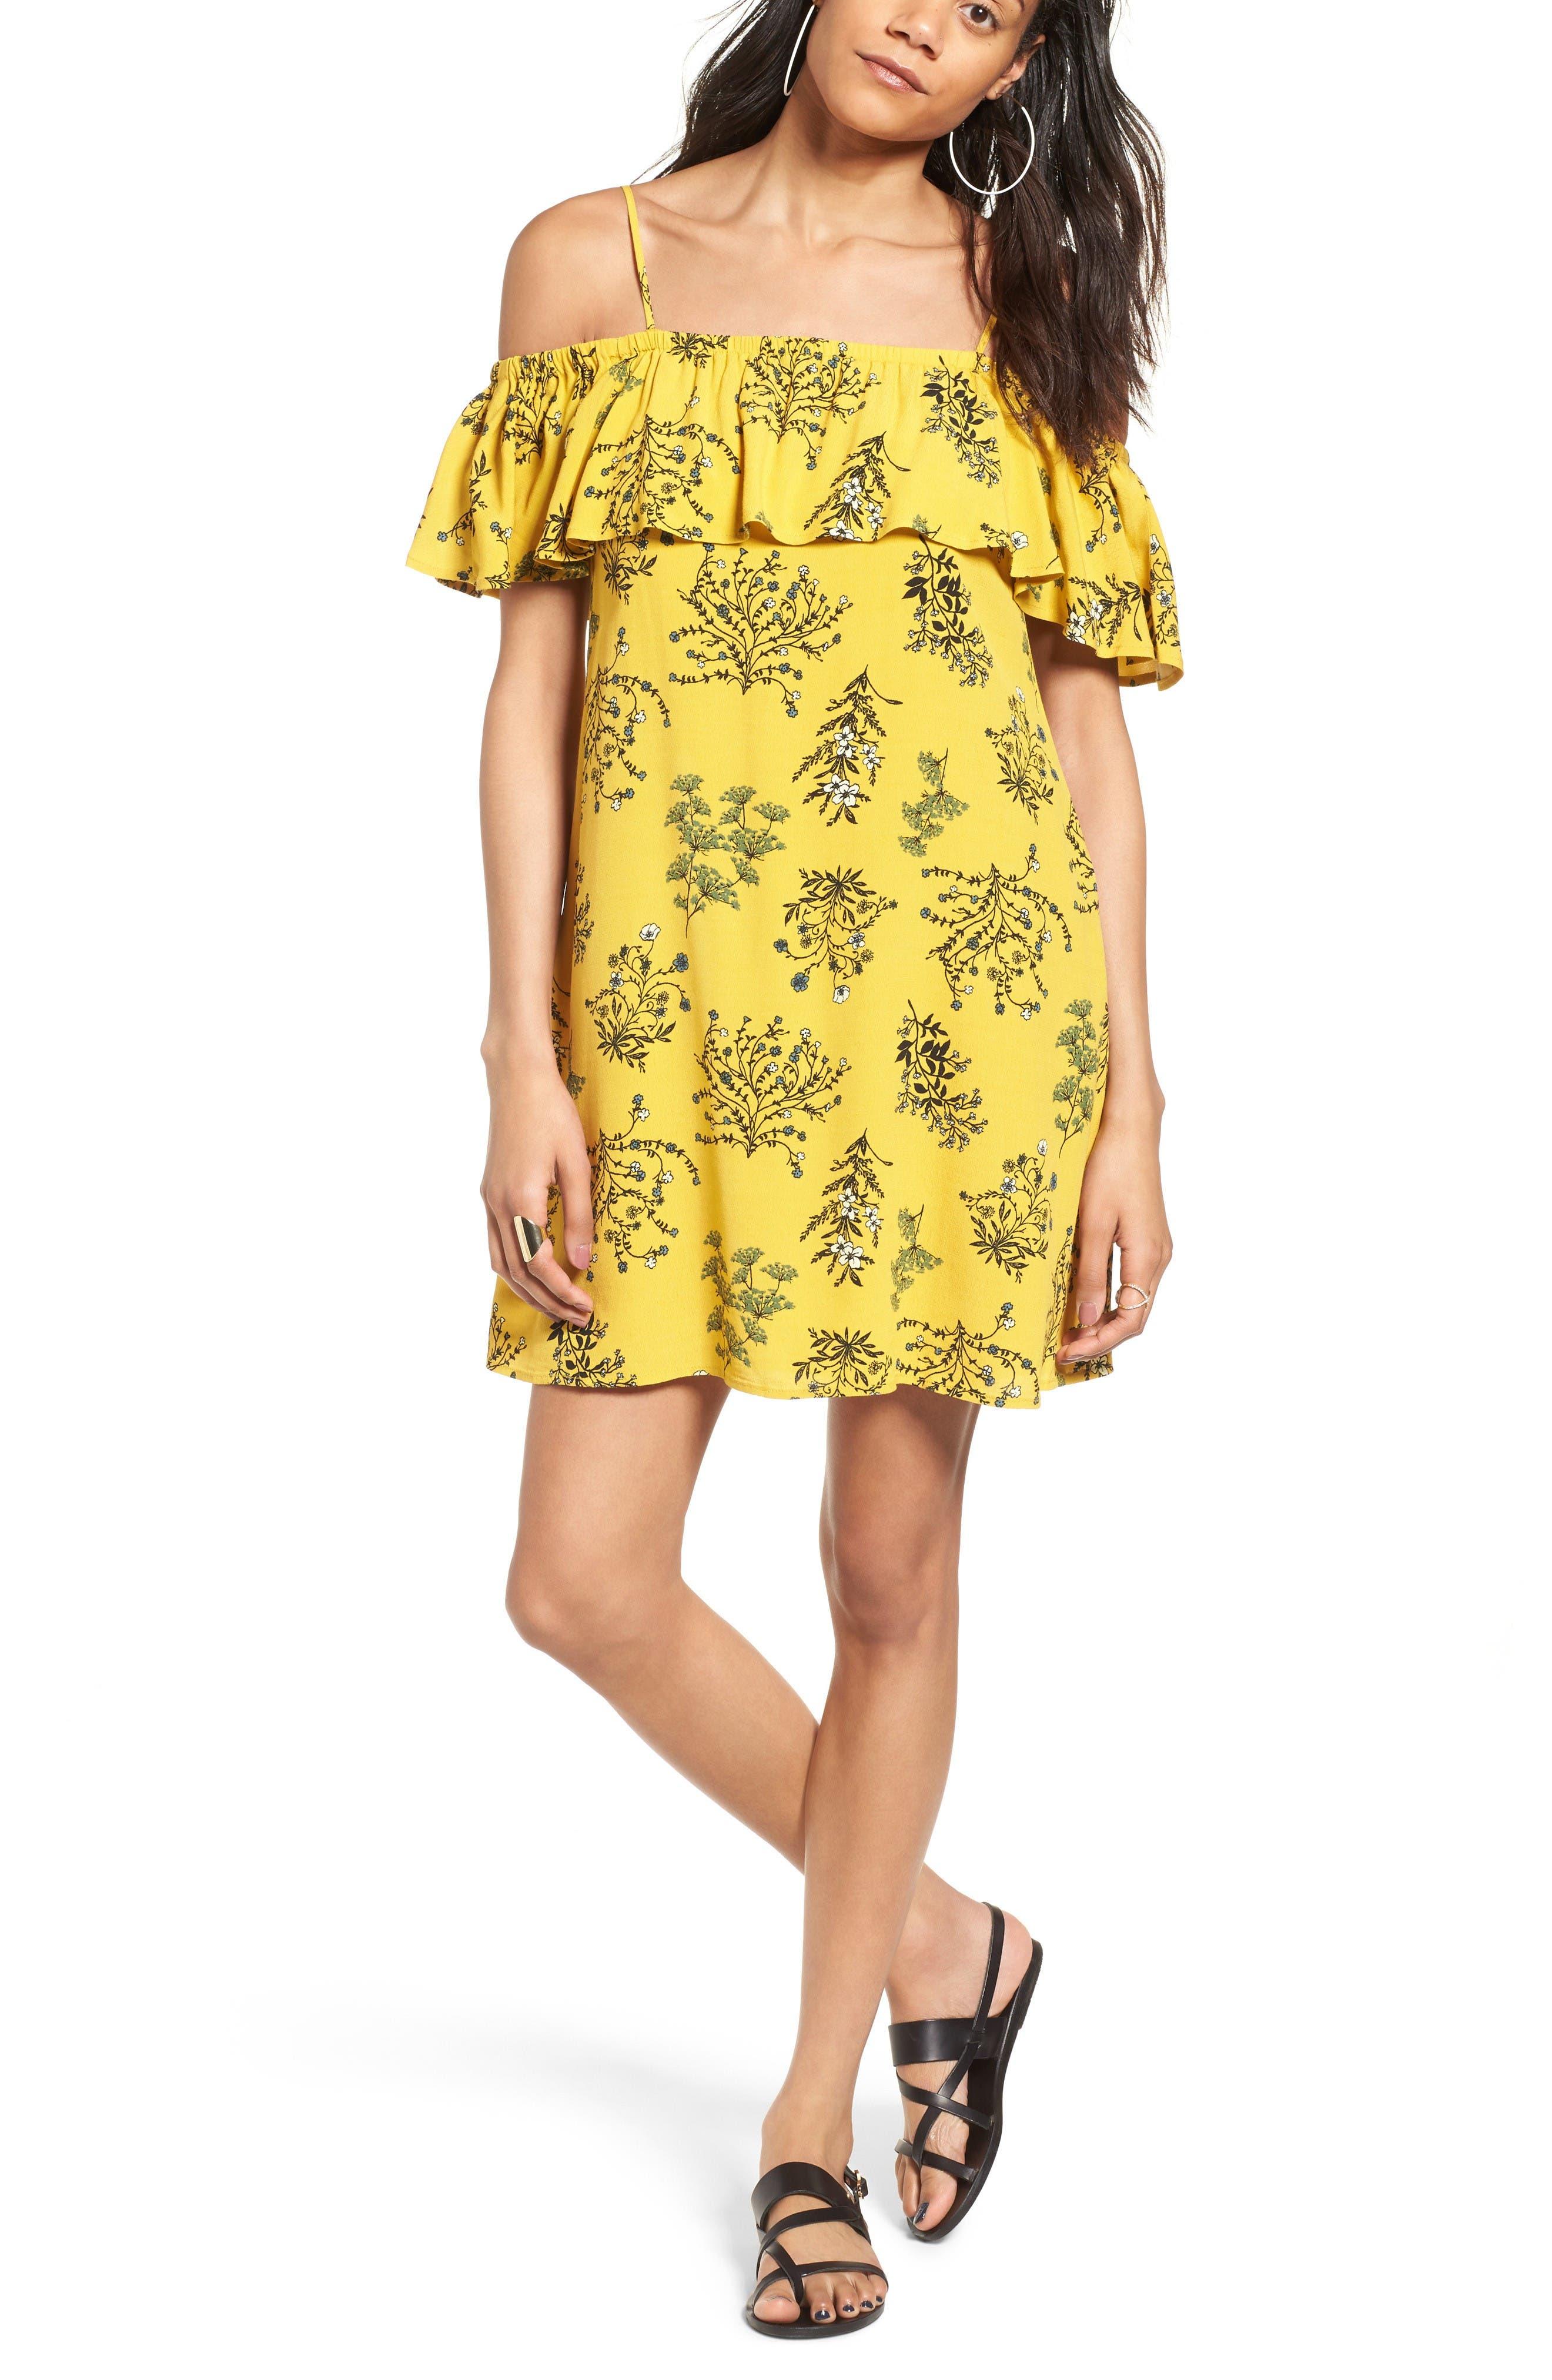 Alternate Image 1 Selected - BP. Ruffle Cold Shoulder Dress